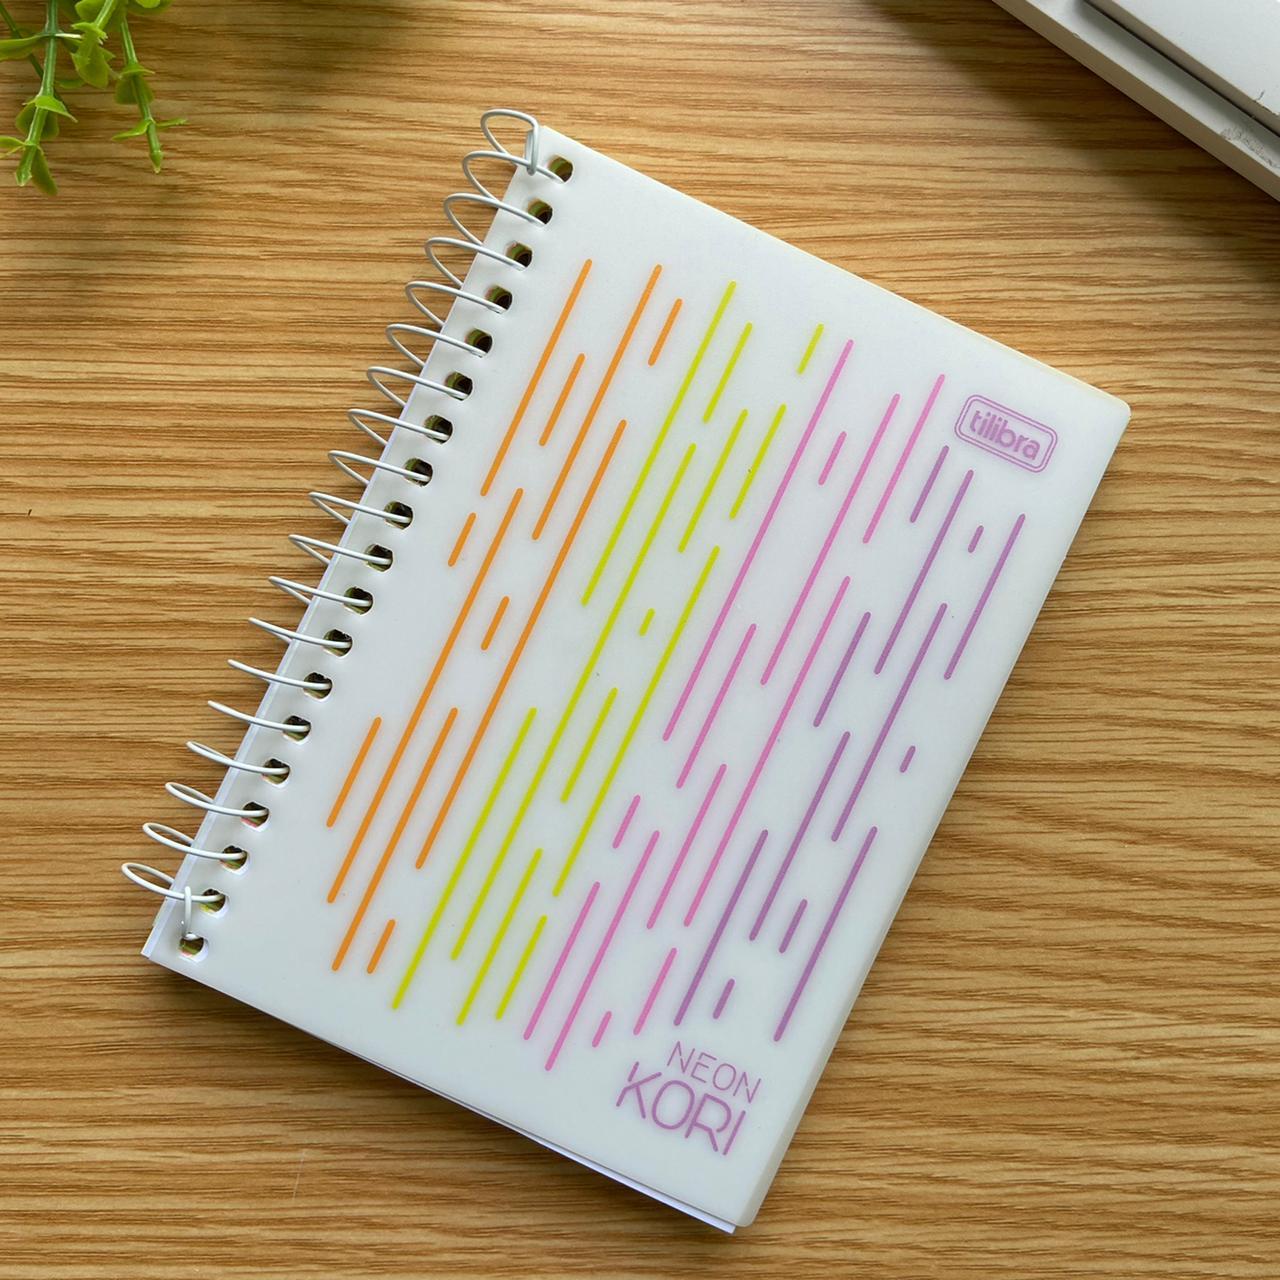 Caderneta Kori Folhas Coloridas Espiral Capa Plastica 1/8 sem Pauta Neon Kori 80 FL | Tilibra